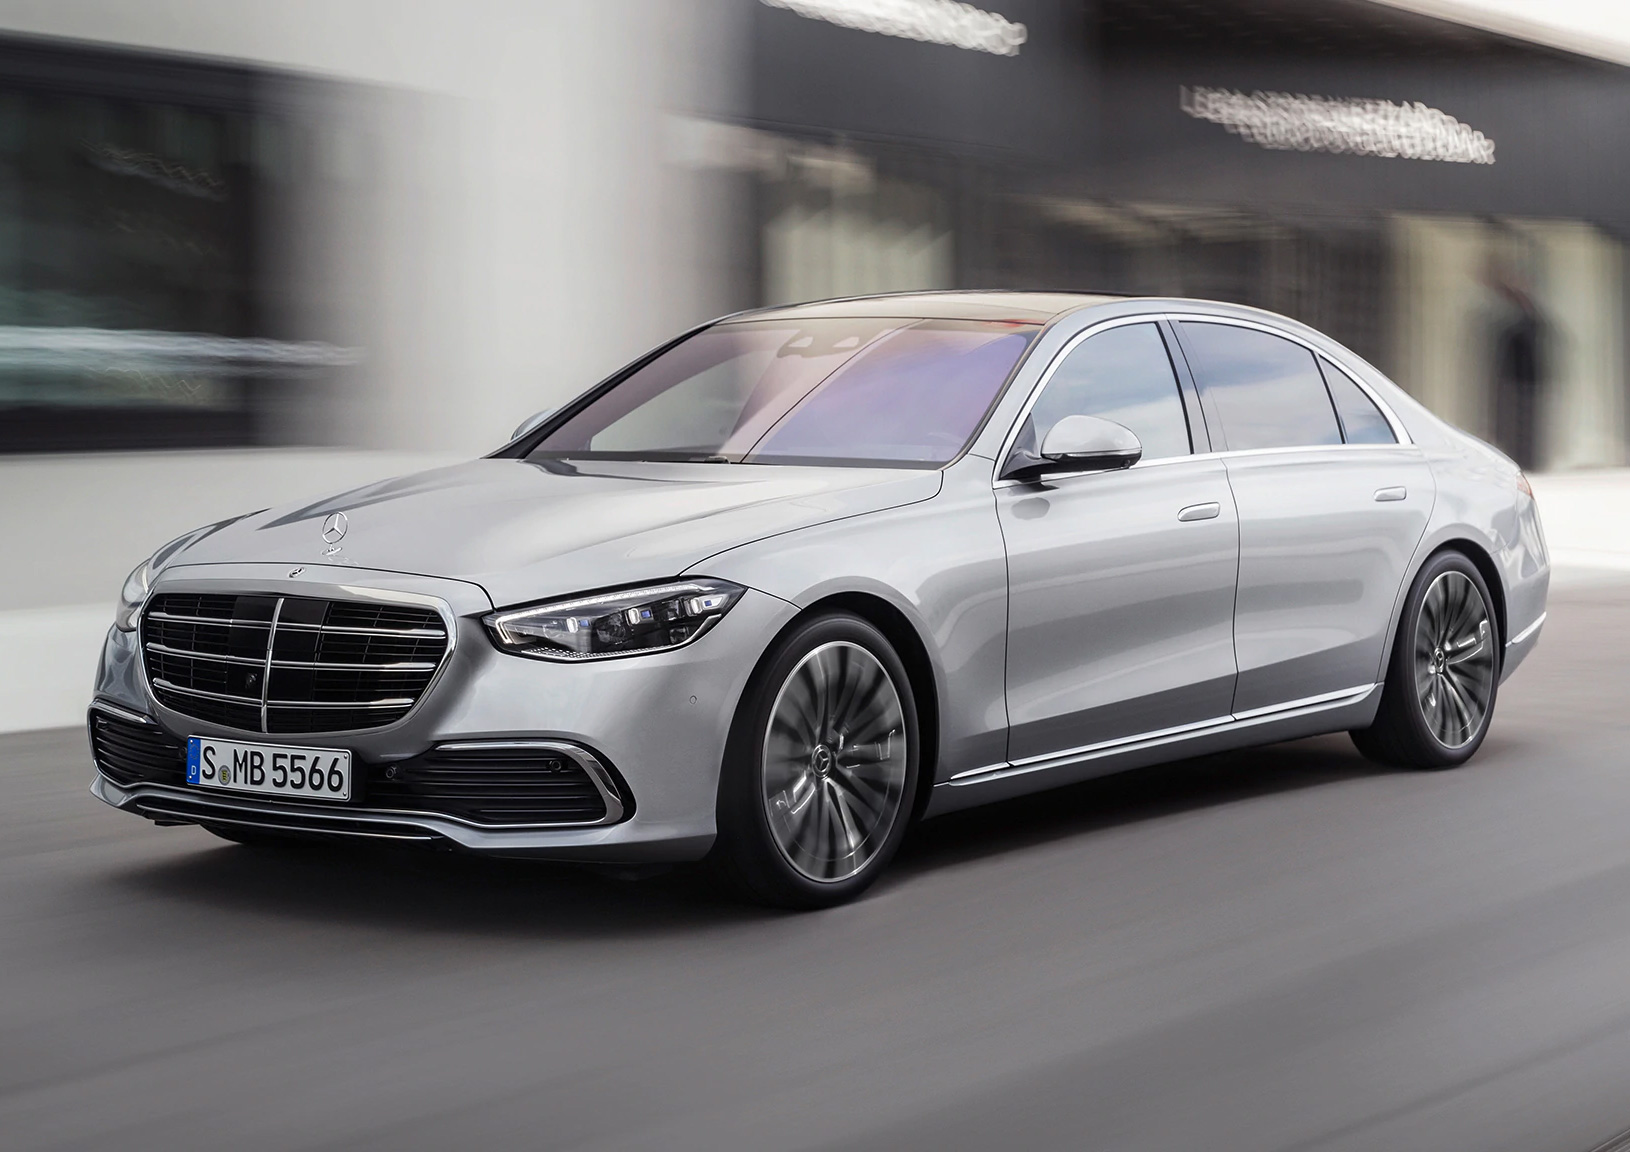 Mercedes Unveils Redesigned 2021 S-Class at werd.com